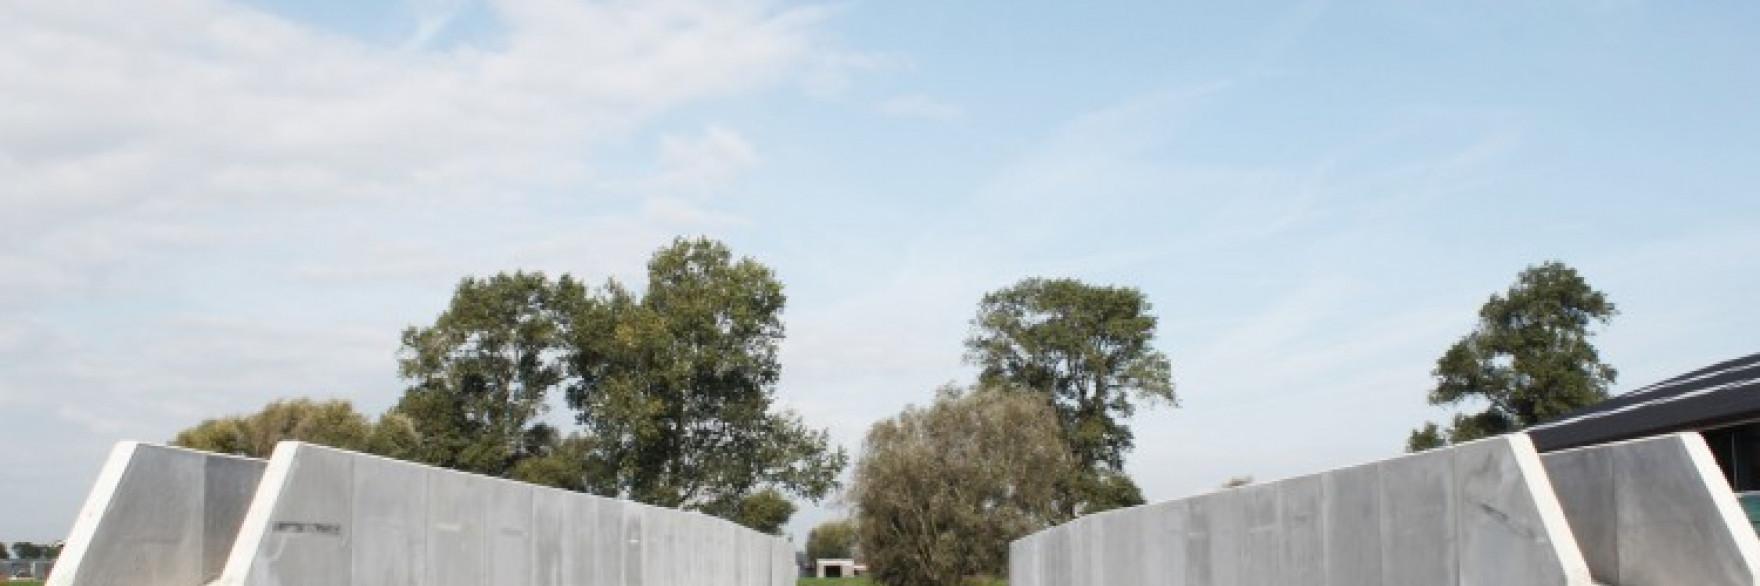 Betonproducten tuinaannemer